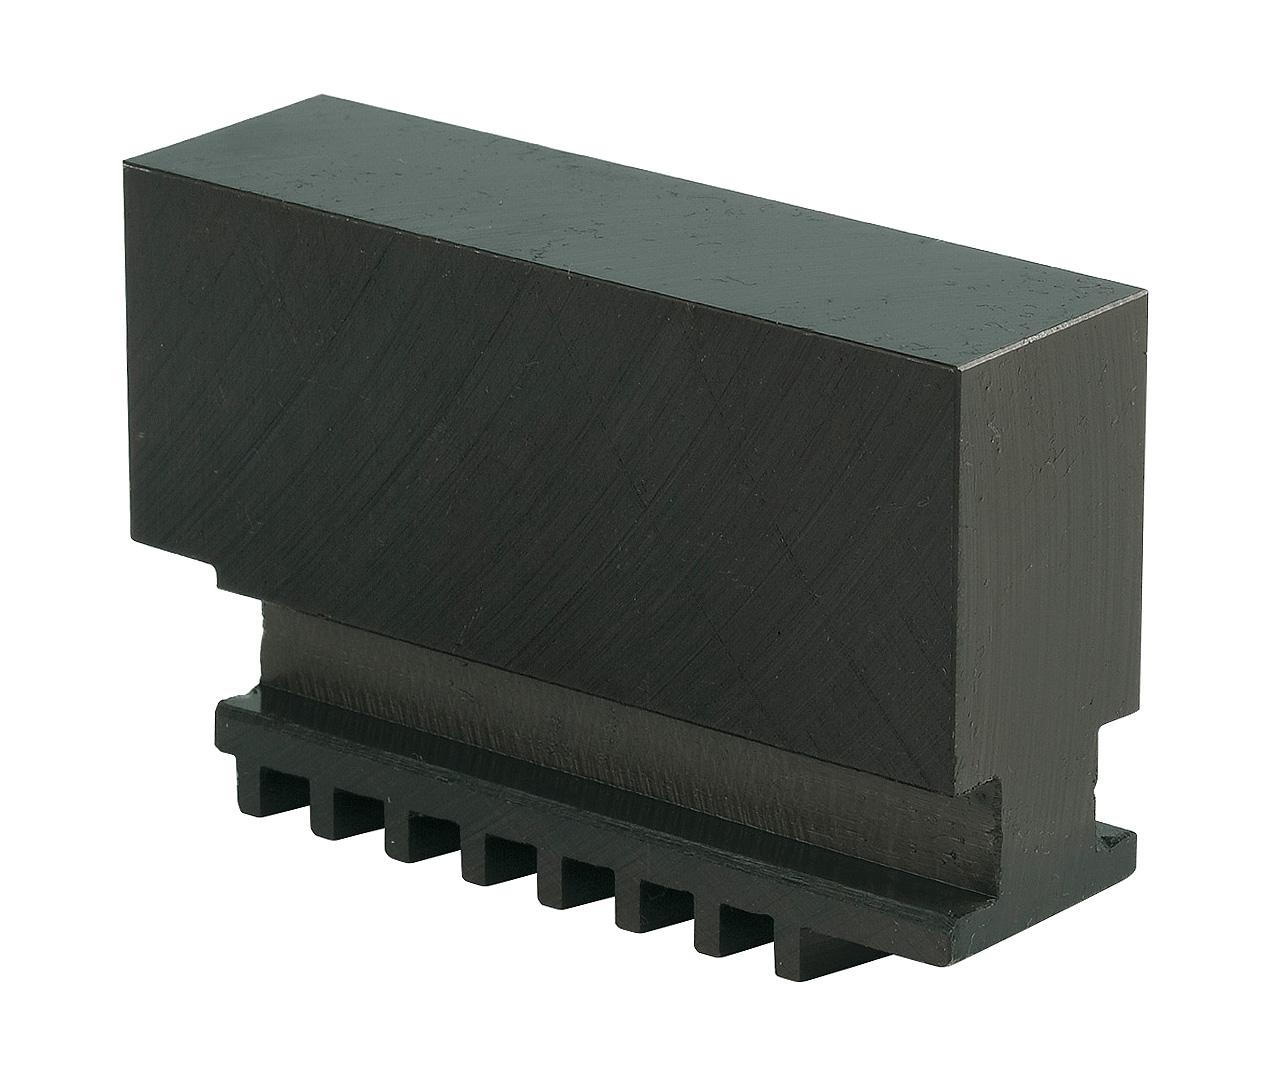 Szczęki jednolite miękkie - komplet DSJ-DK11-80 BERNARDO